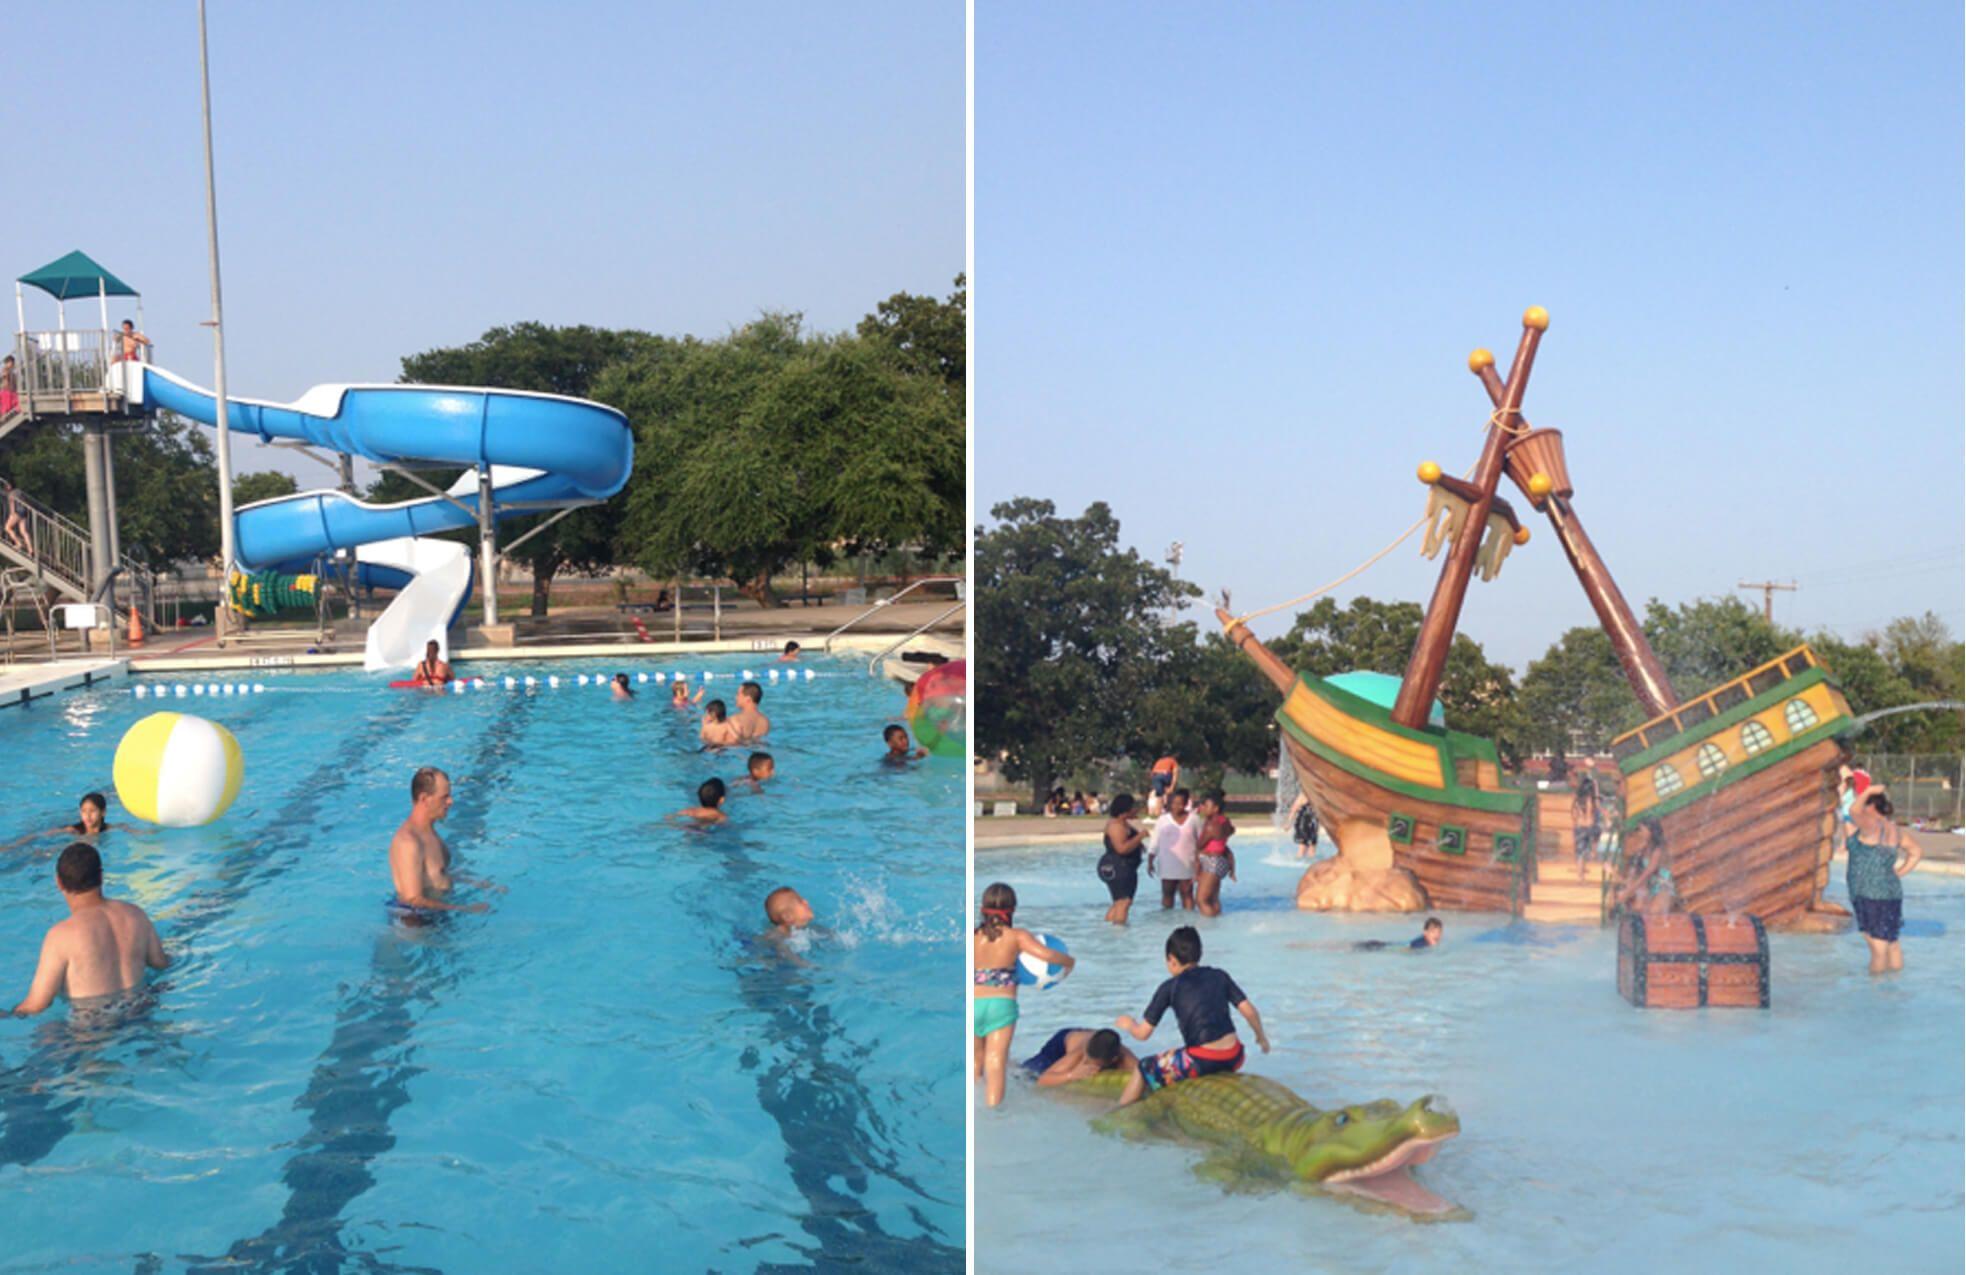 Micki Krebsbach Swimming Pool Pirate Ship Splash Pad Pool Swimming Pools Lap Swimming